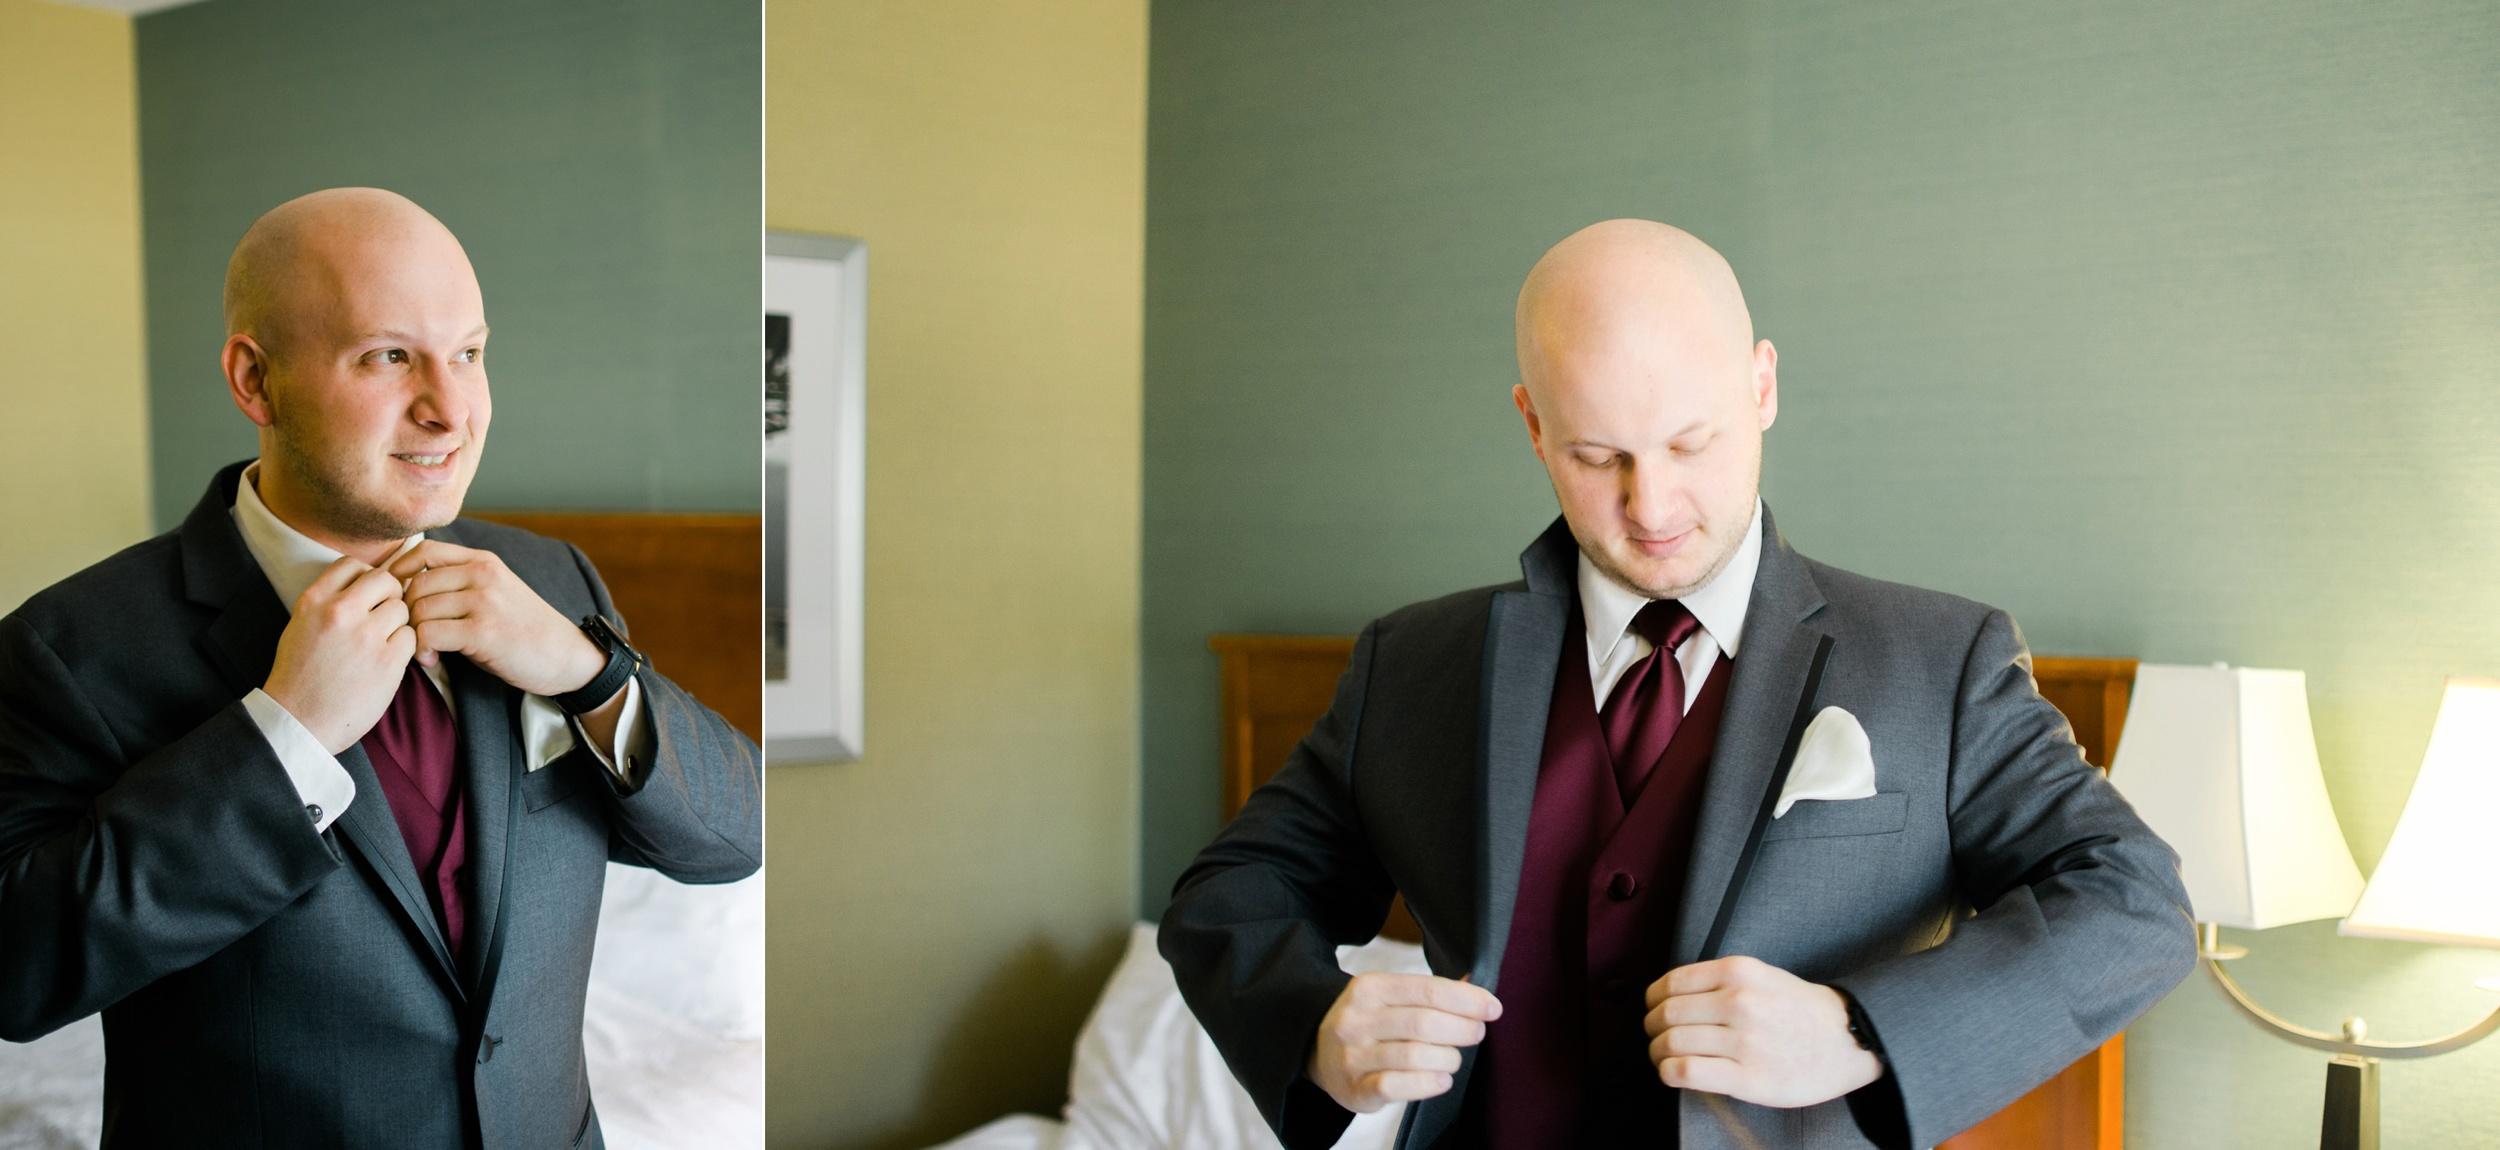 Glensheen Mansion Wedding | Duluth, MN Wedding Photographer_0457.jpg